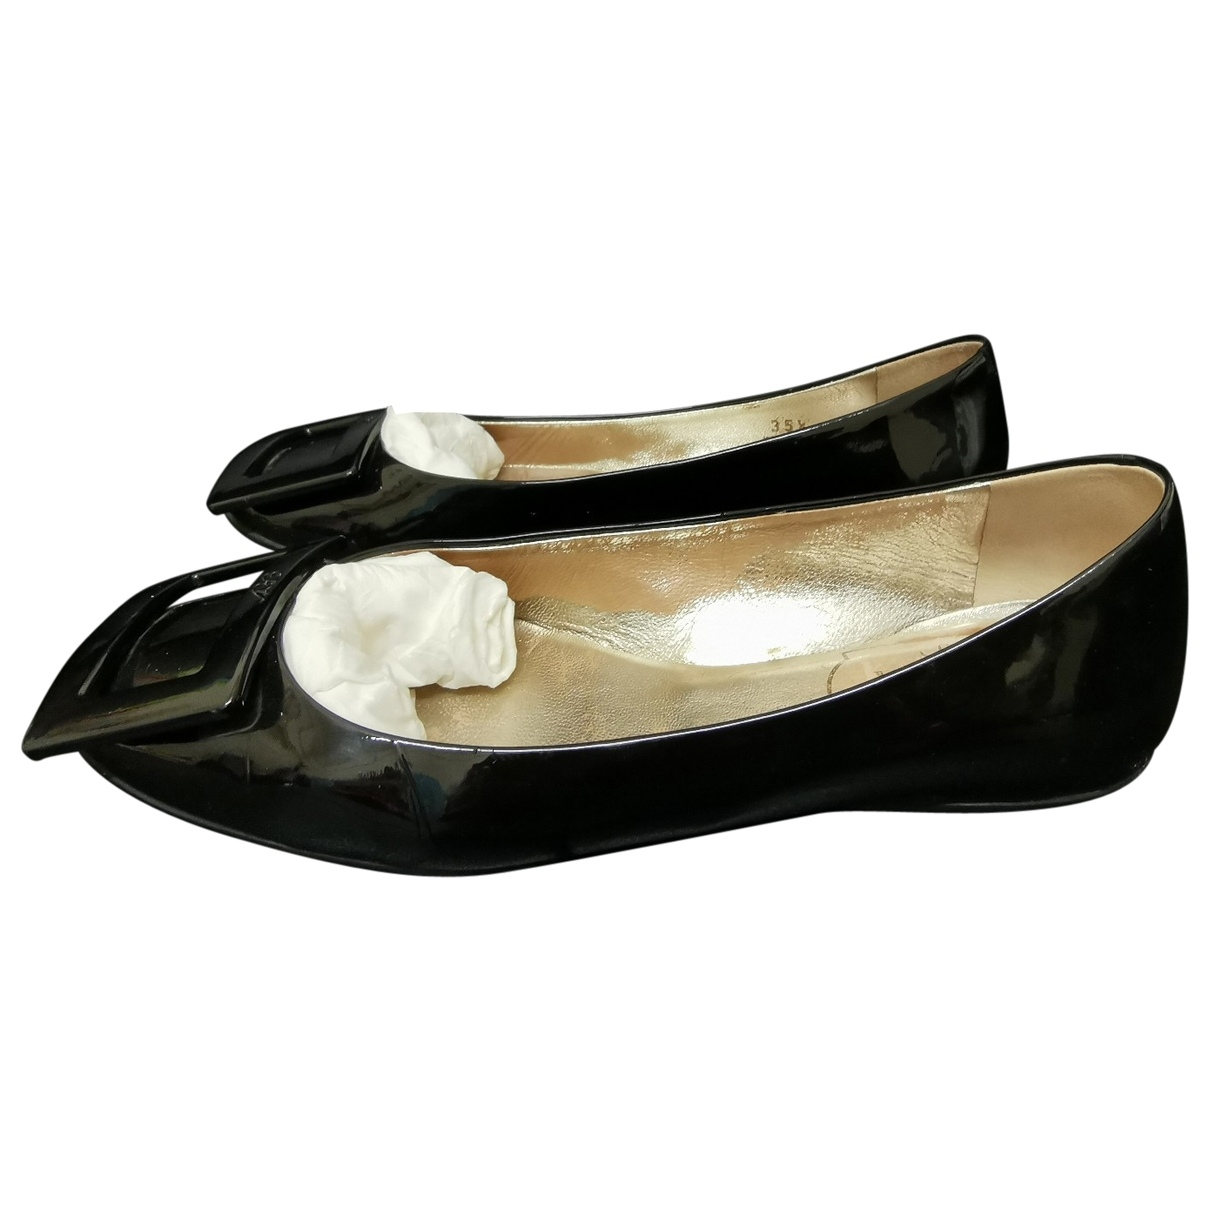 Roger Vivier Gommetine Black Patent leather Ballet flats for Women 35.5 EU